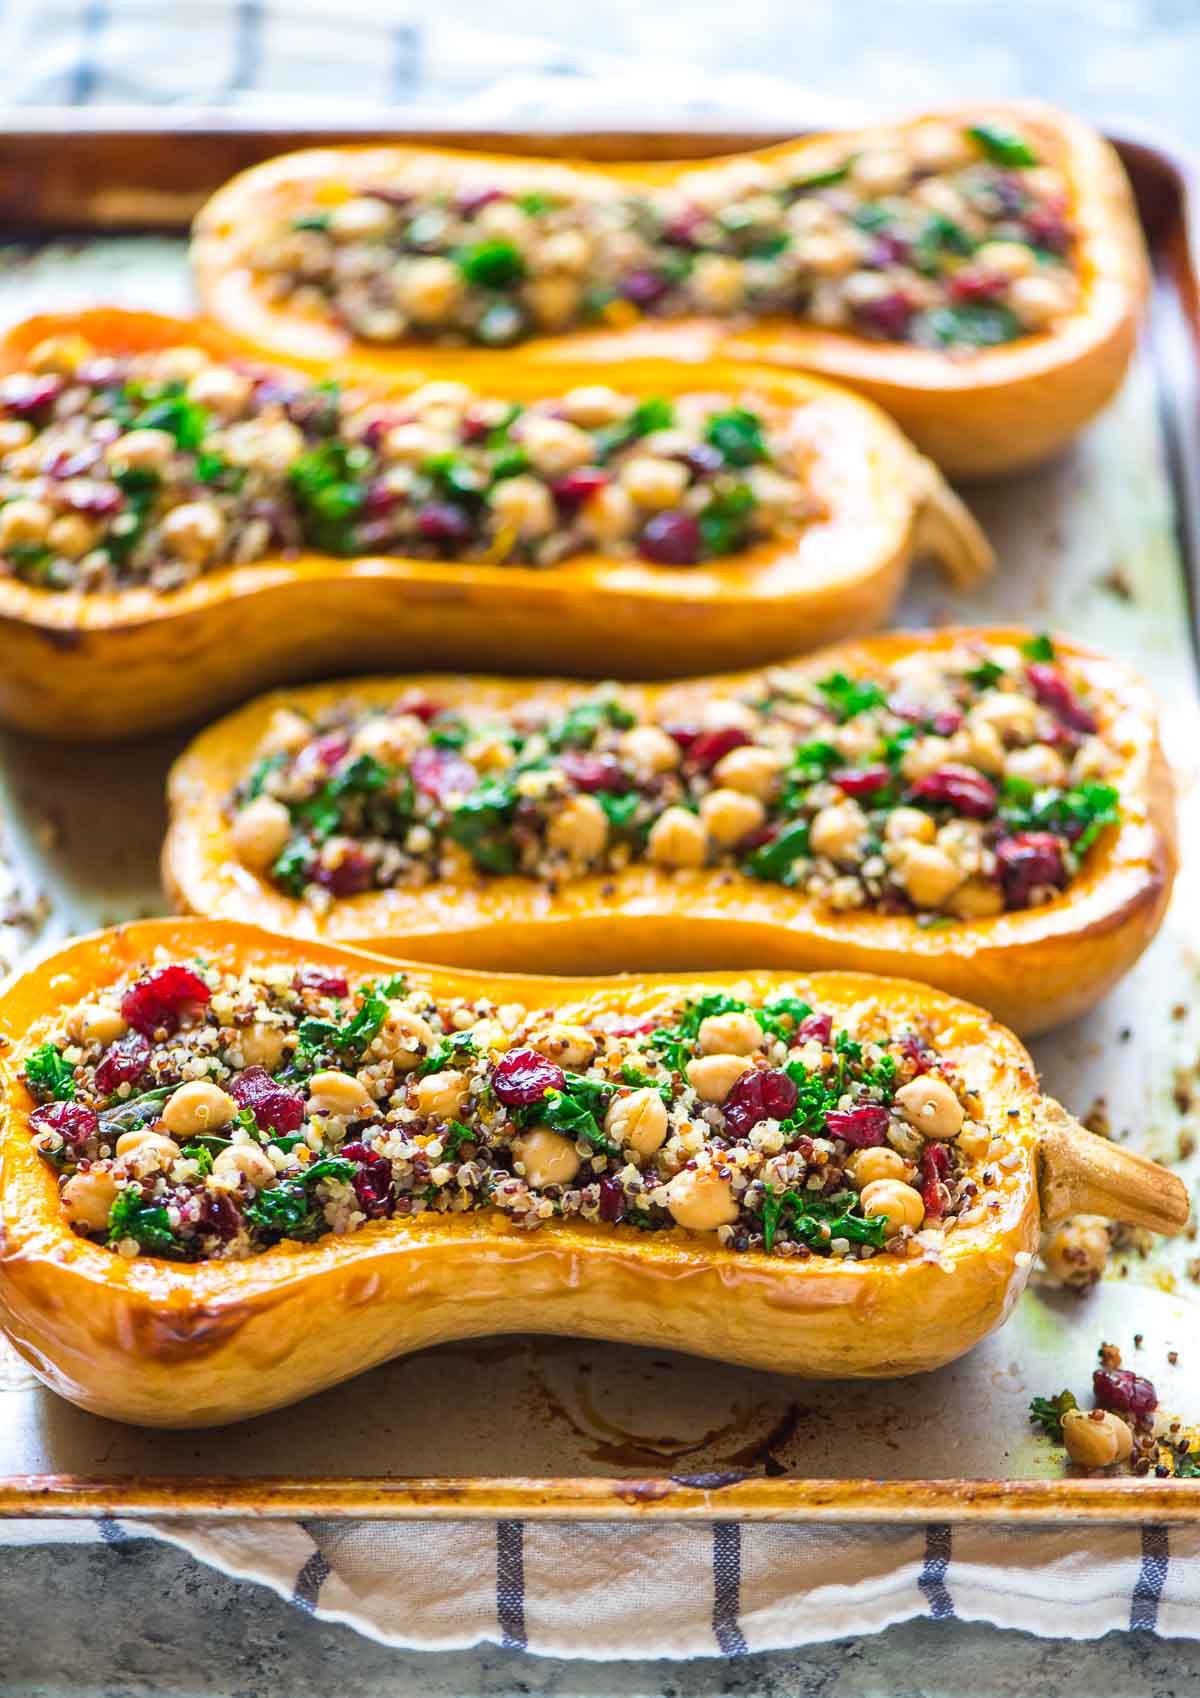 Vegan Fall Recipes  8 Healthy Fall Dinner Recipes MOMables Good Food